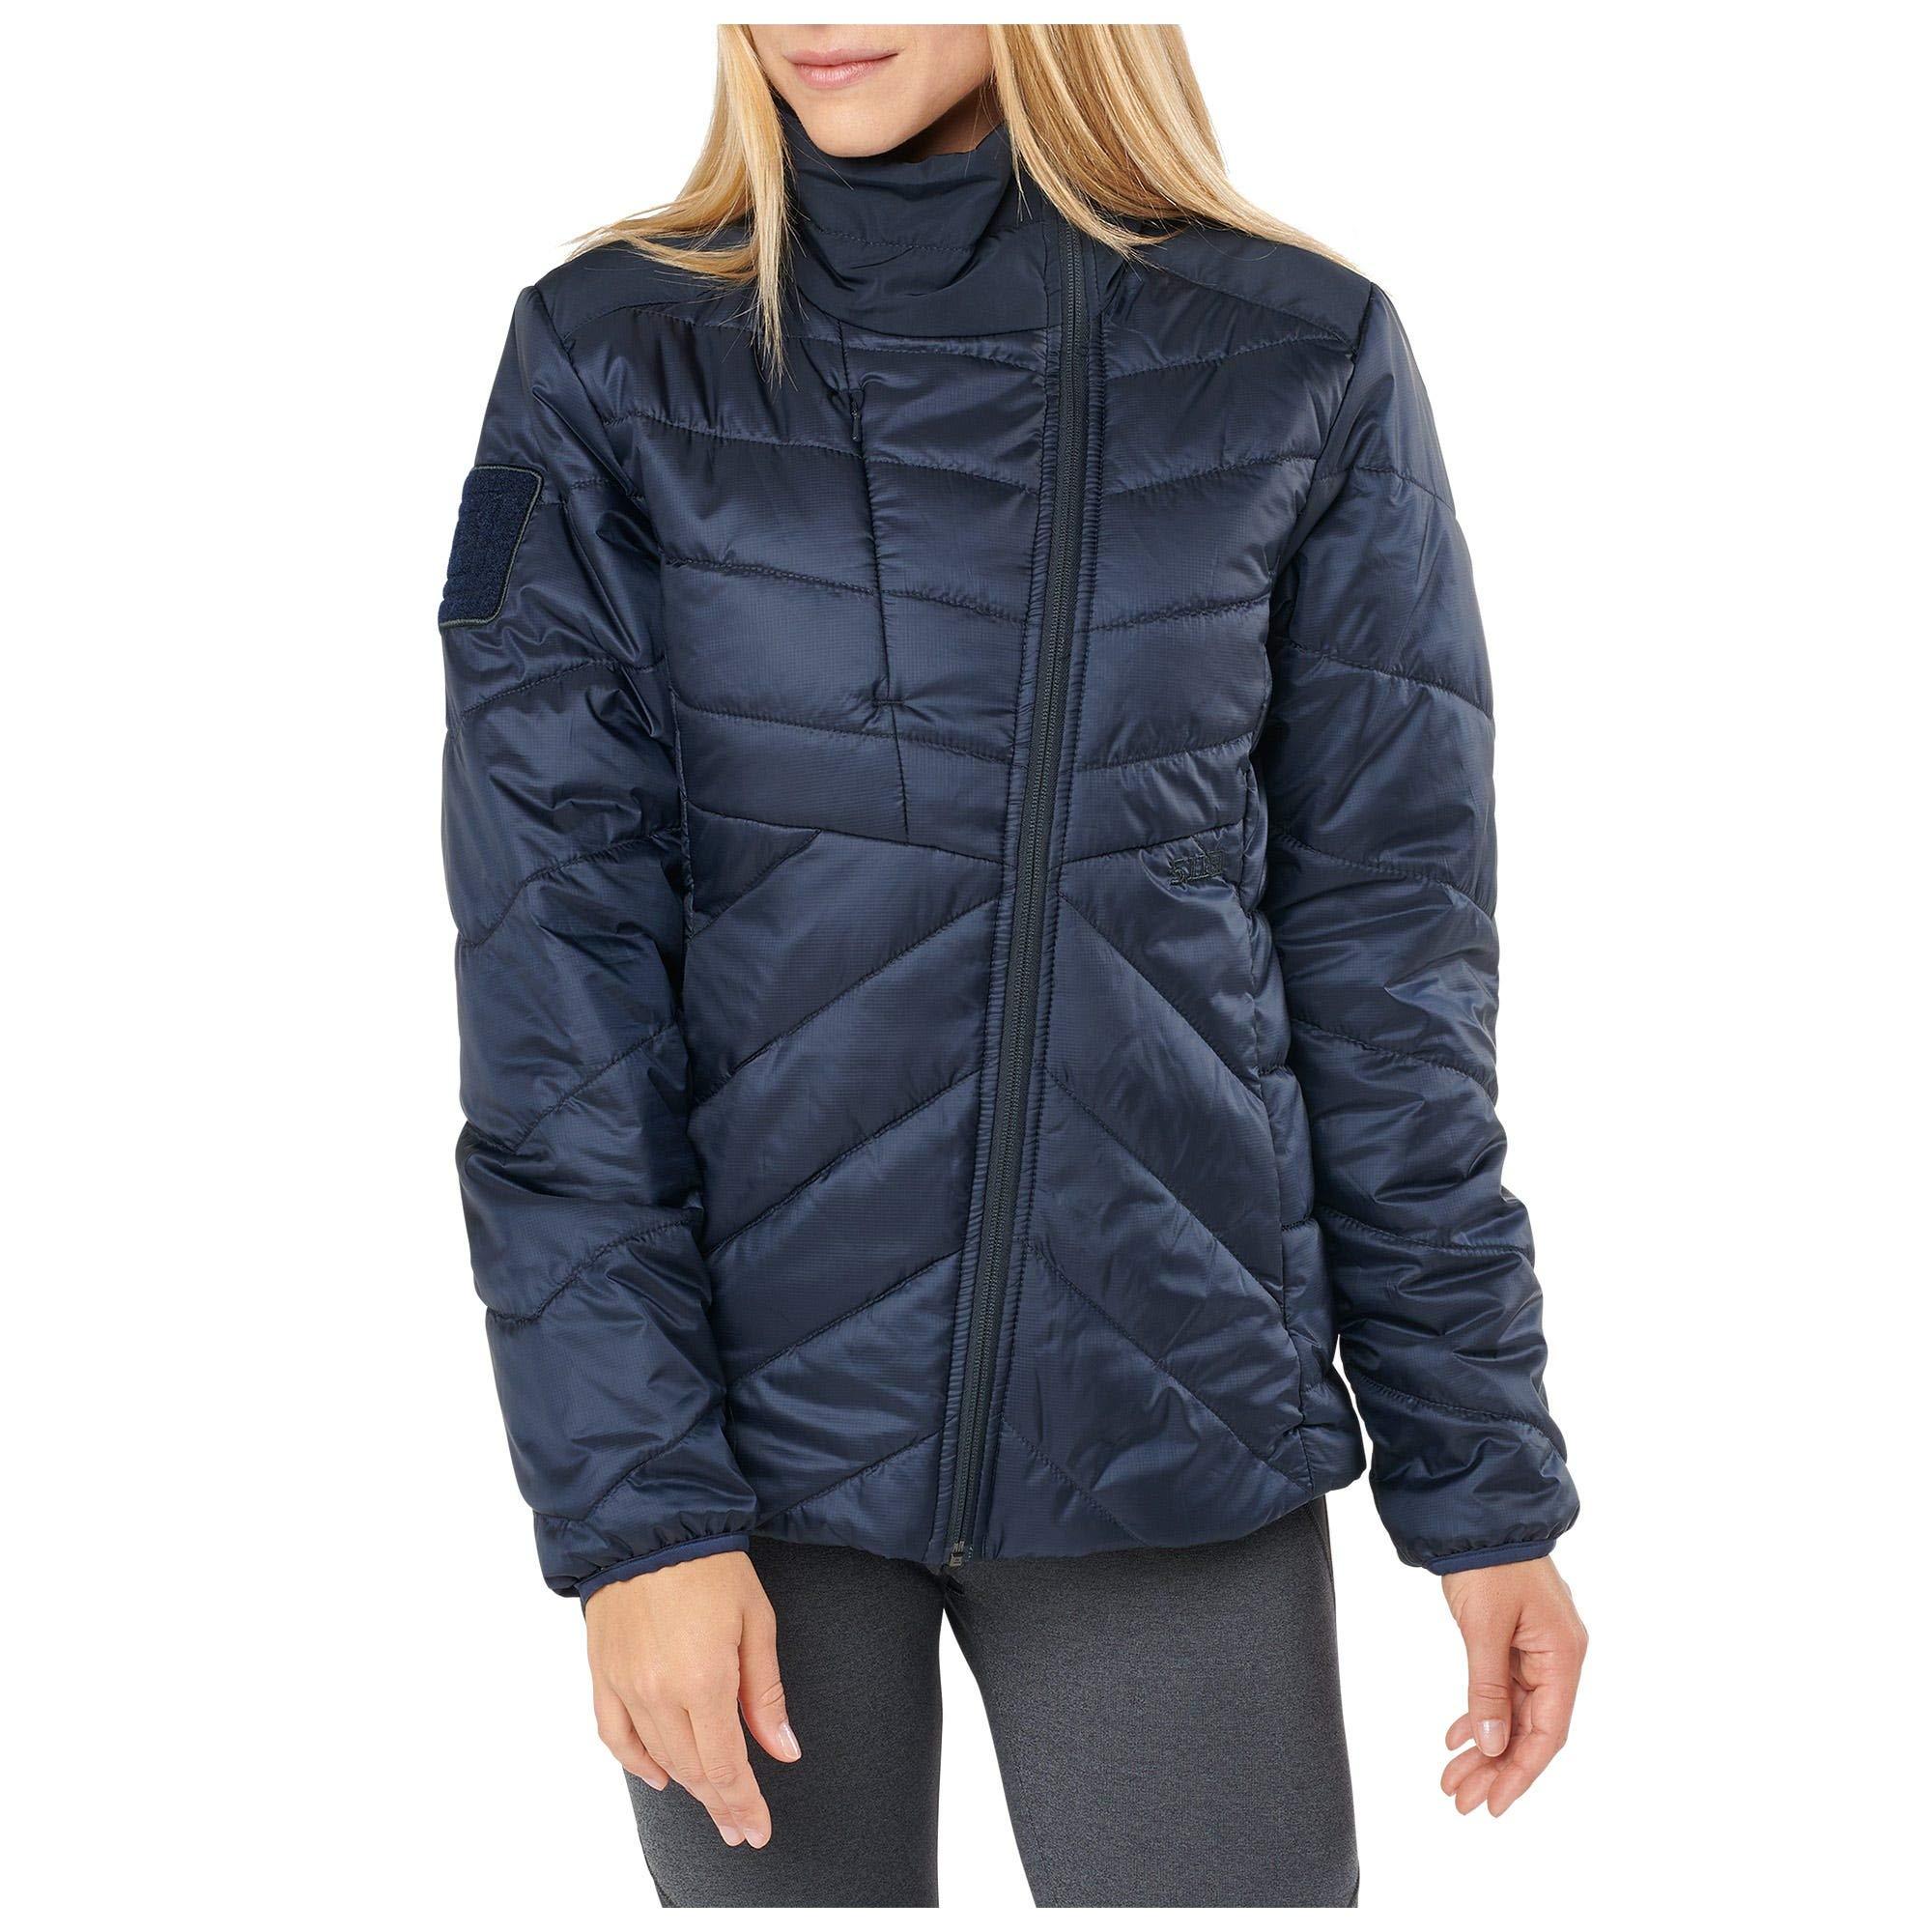 5.11 Tactical Women's Peninsula Insulator Packable Jacket, Peacoat, XL, 38076 by 5.11